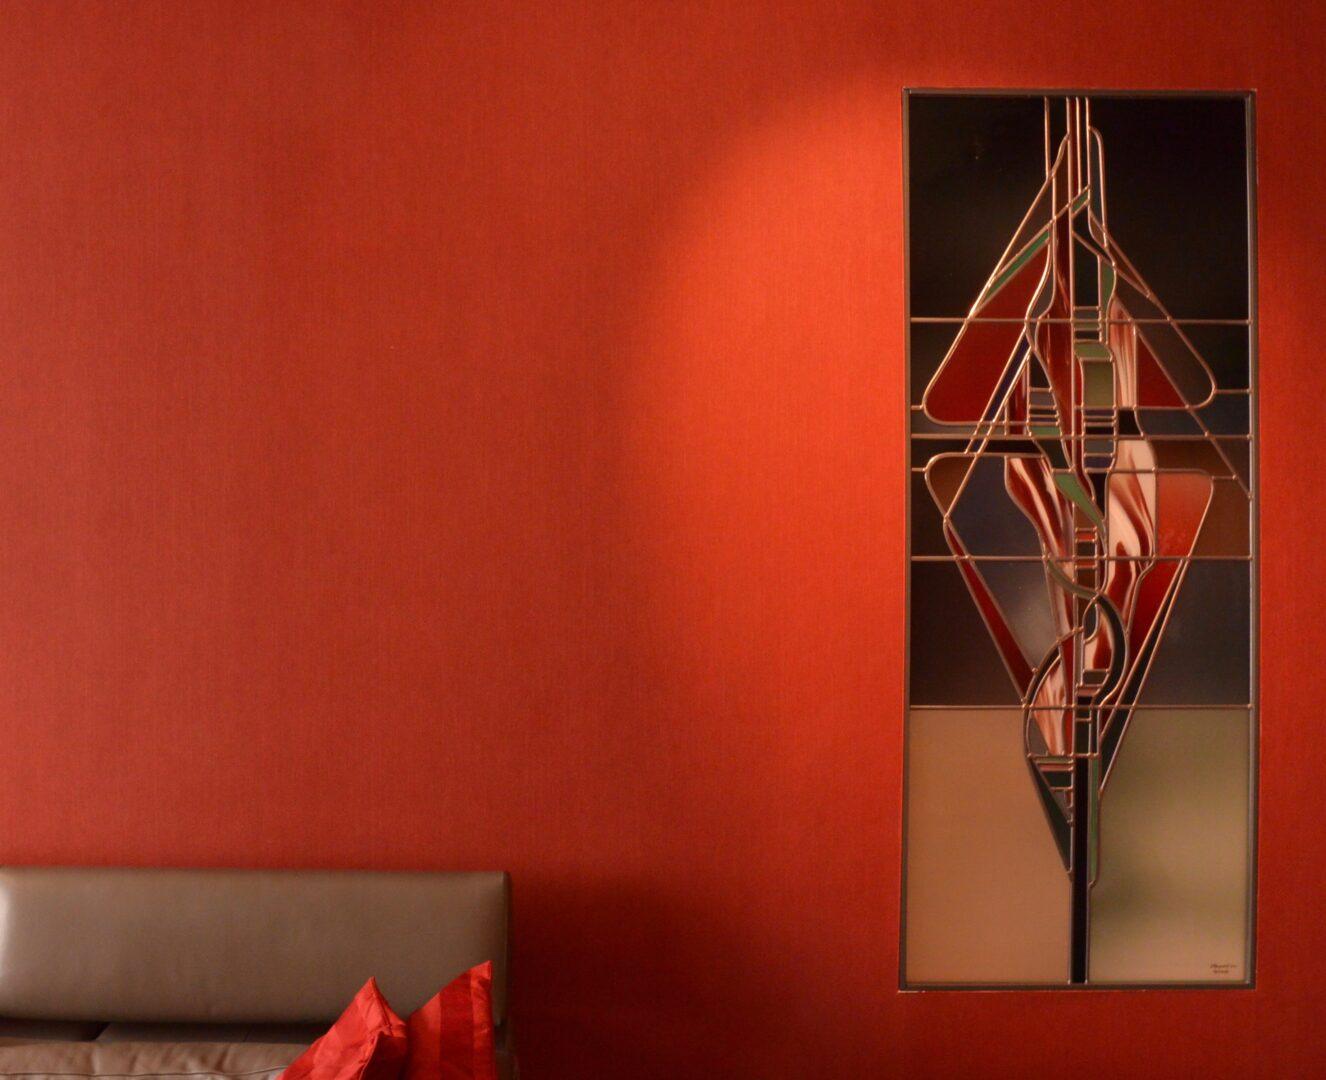 Lyrisch abstract glas-in-lood in wand ingewerkt in woning te Gent. Ontwerp: Ingrid Meyvaert © Atelier Mestdagh